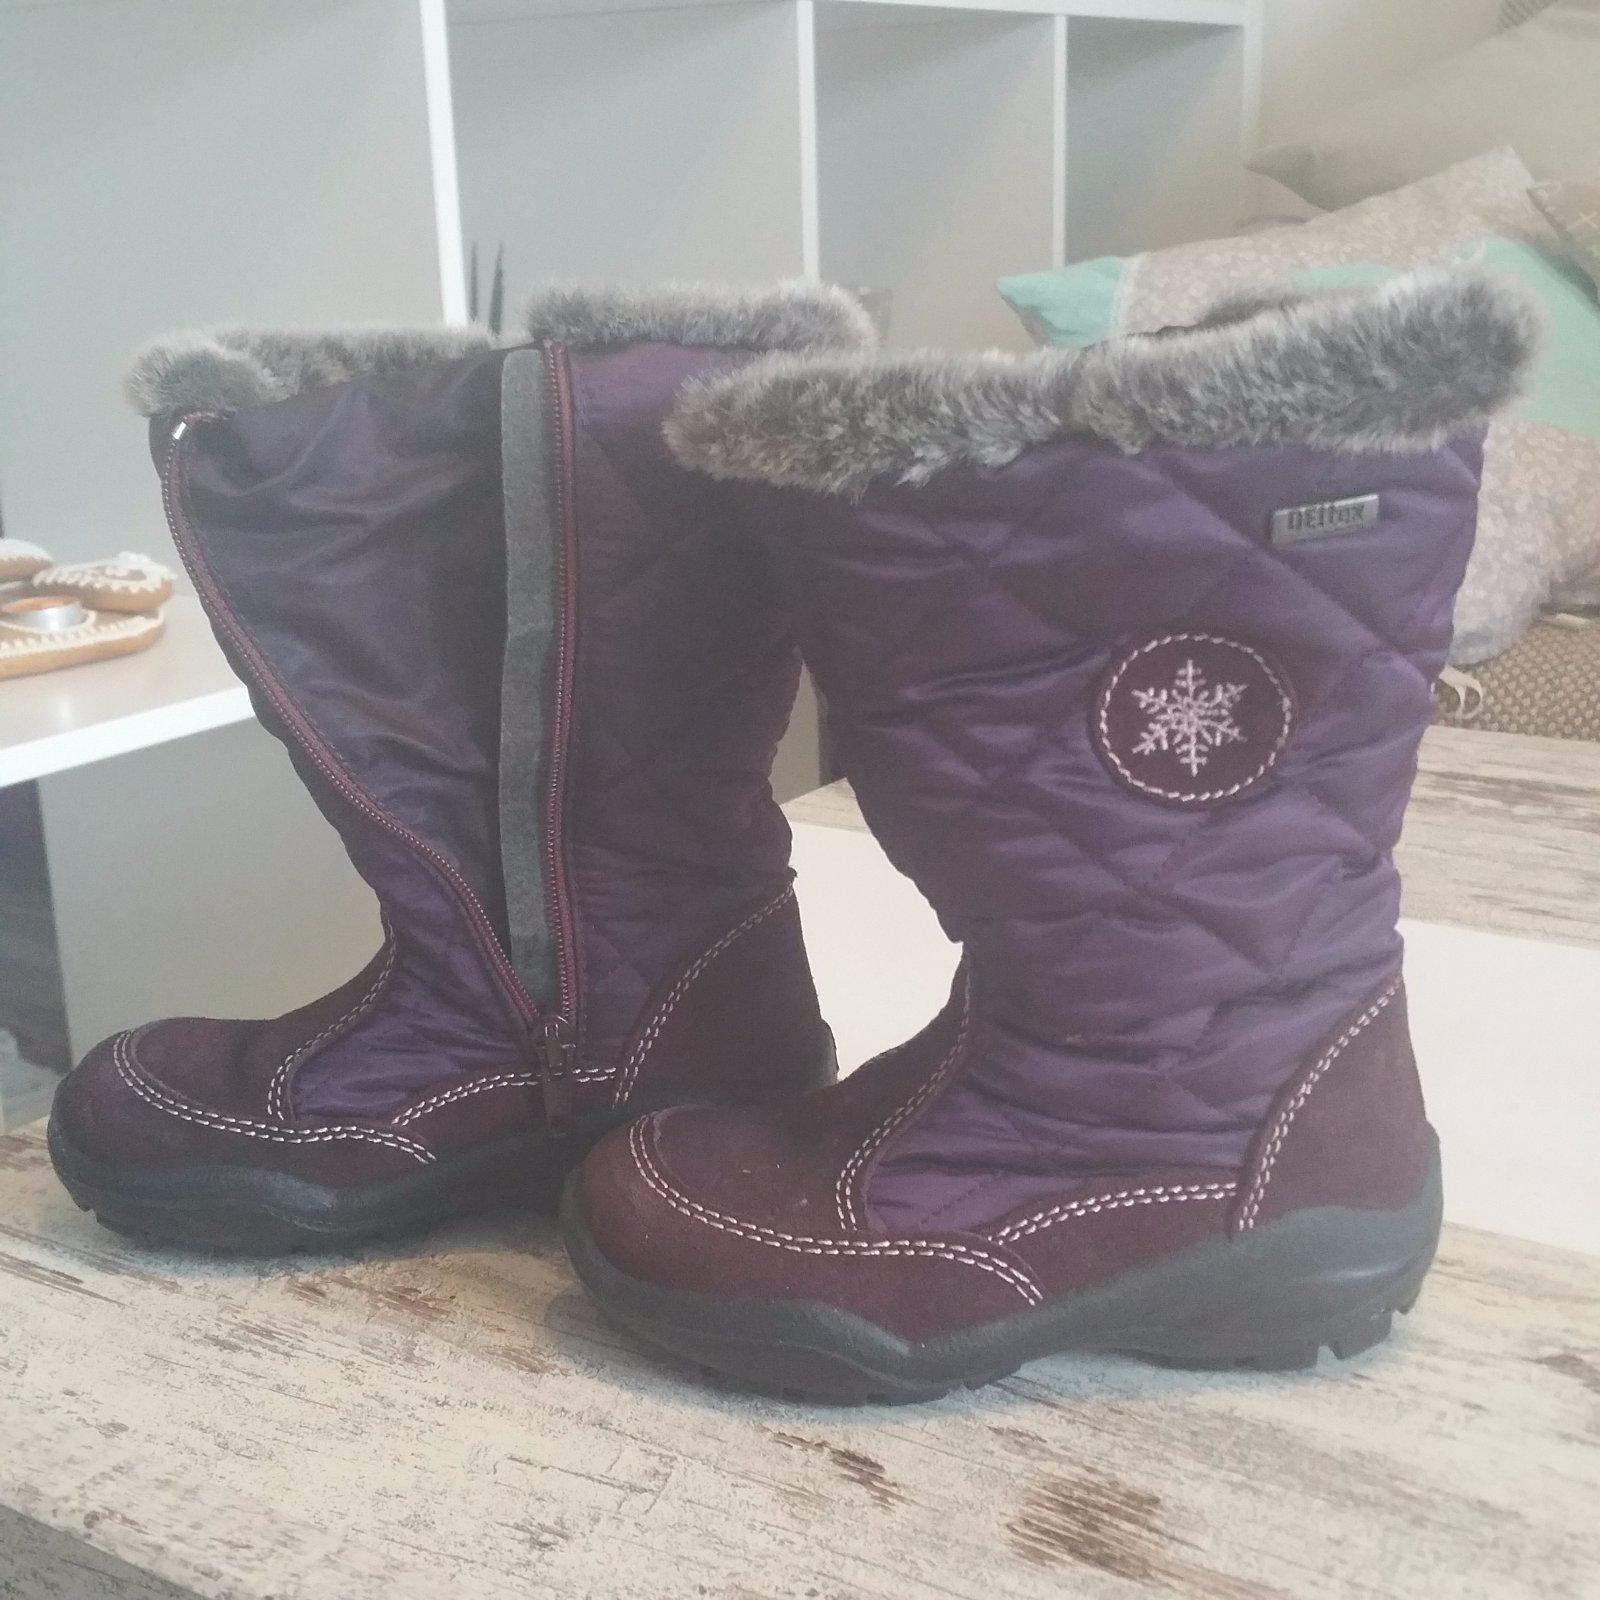 Dievčenské teplé čižmy snehule 80b6897b572